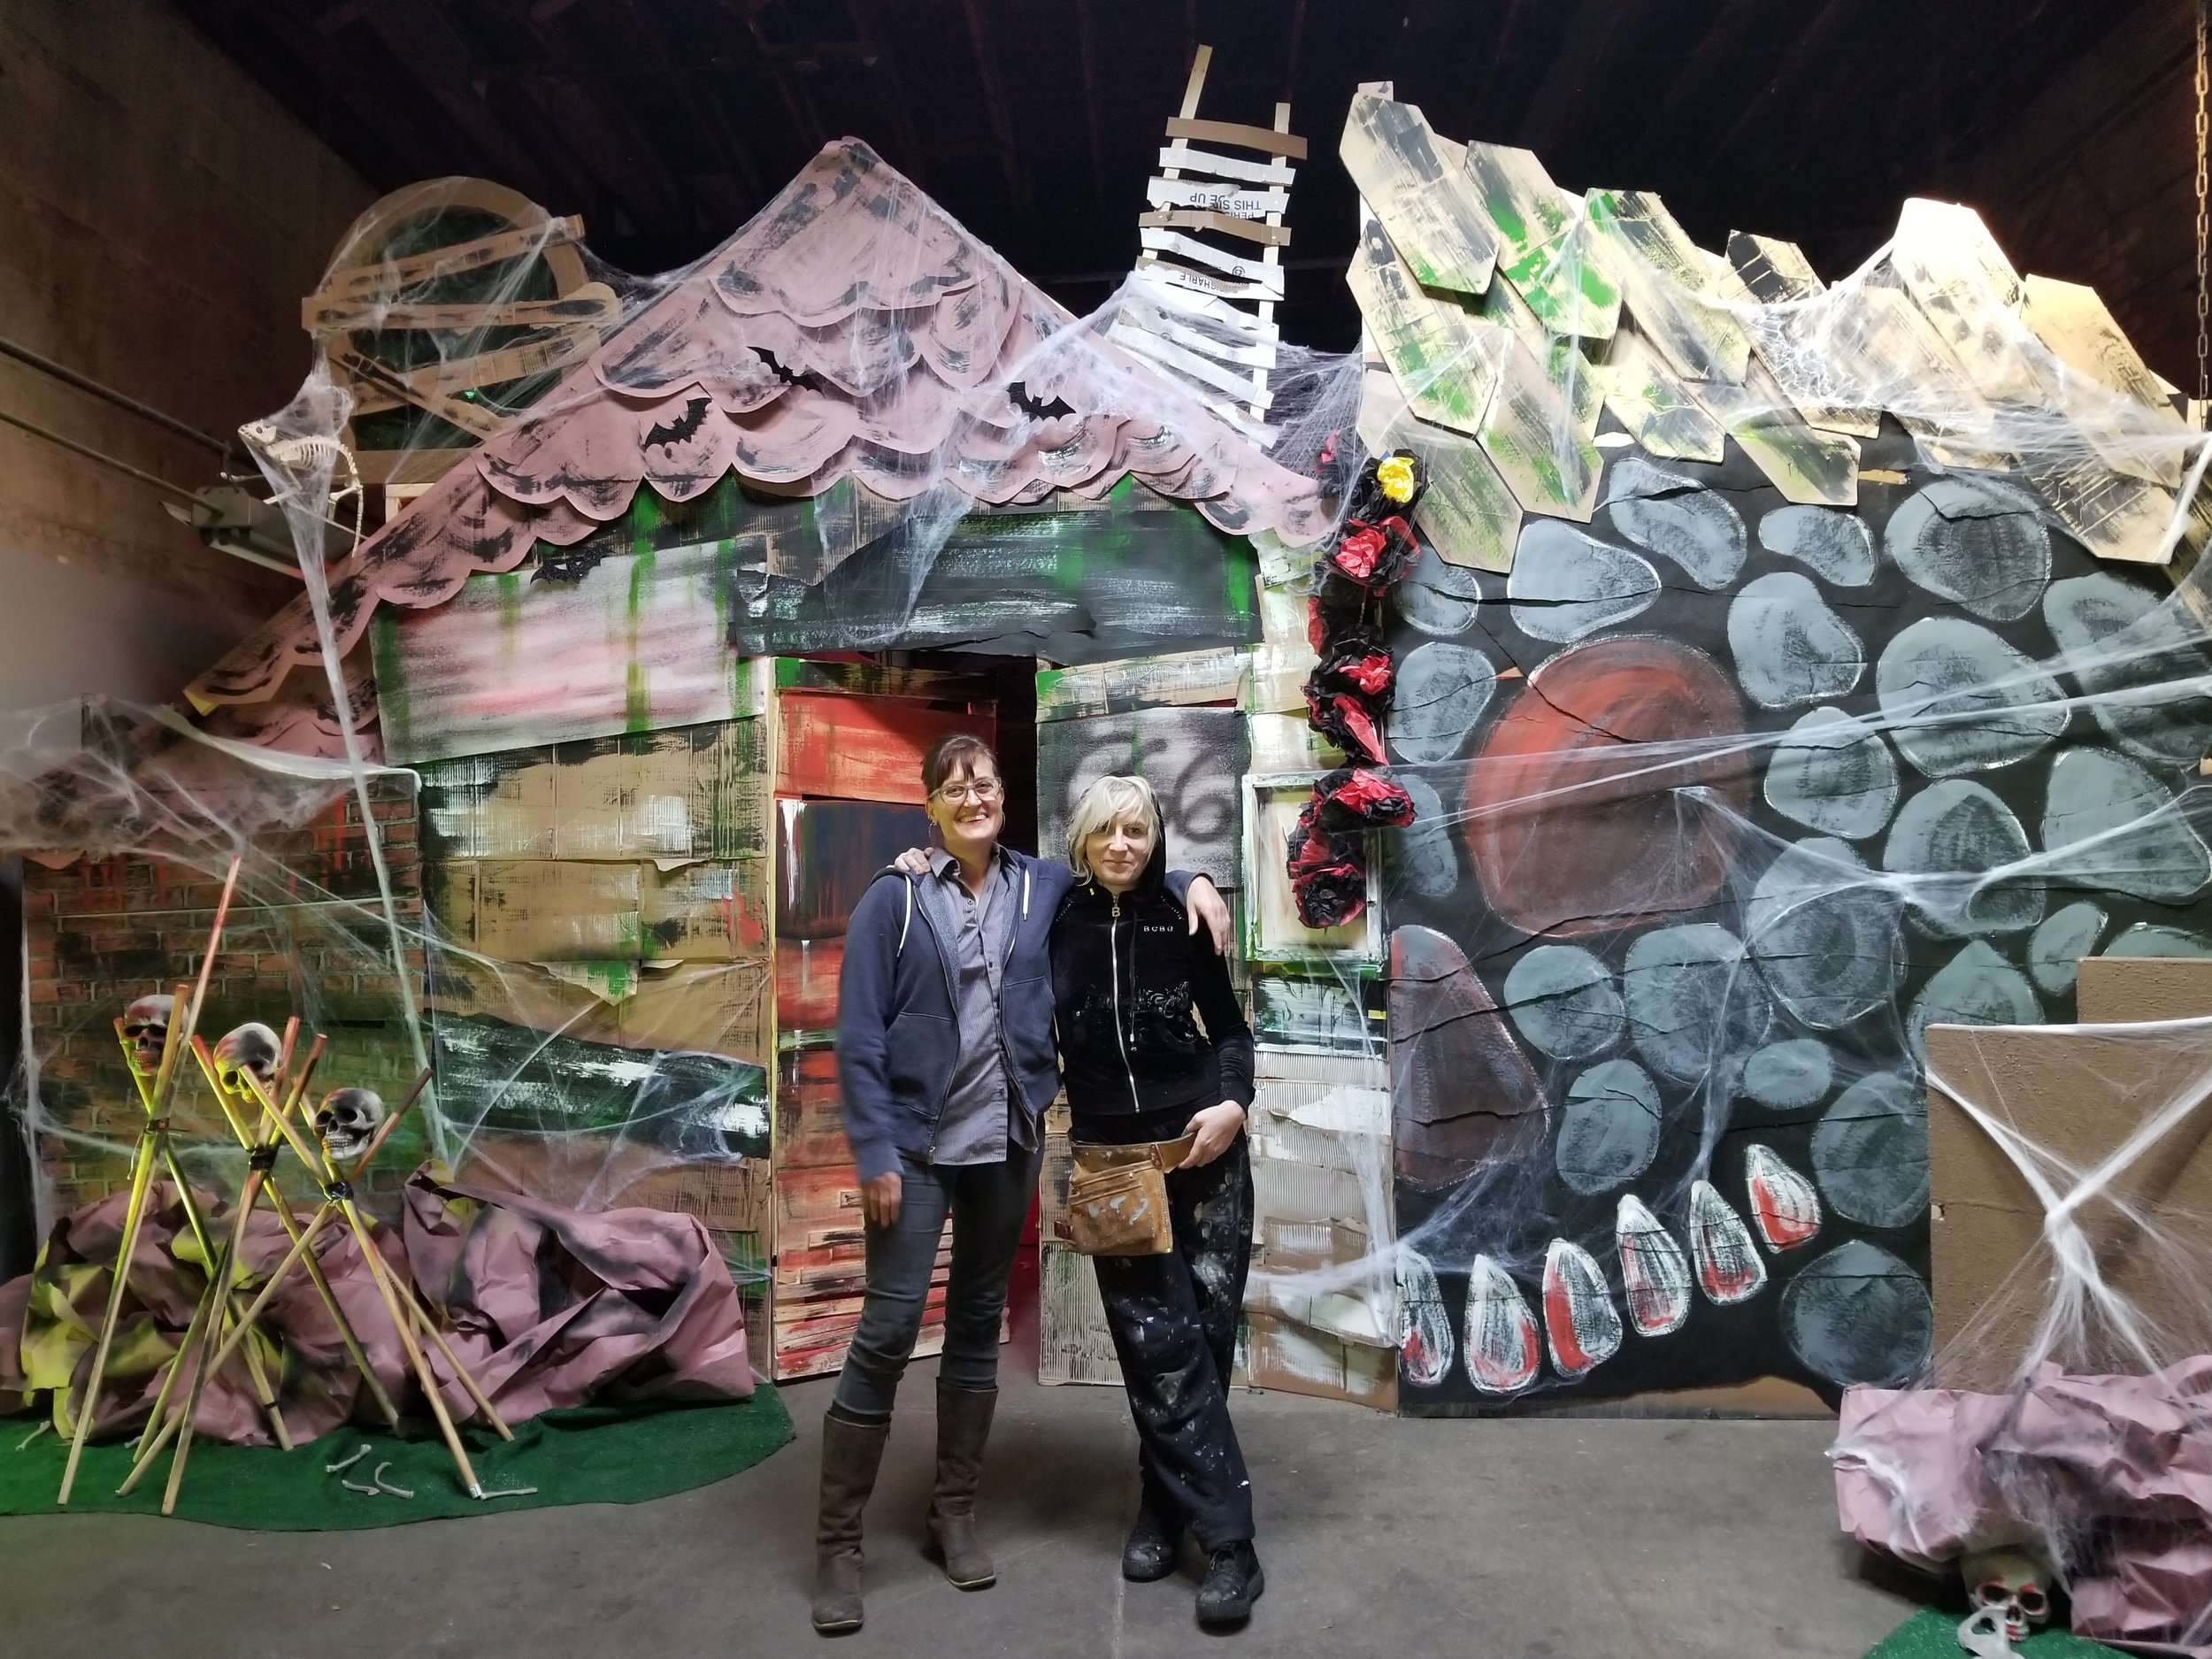 A MEMORY PALACE OF FEAR co-creators, Martha Bayne and Andrea Jablonski